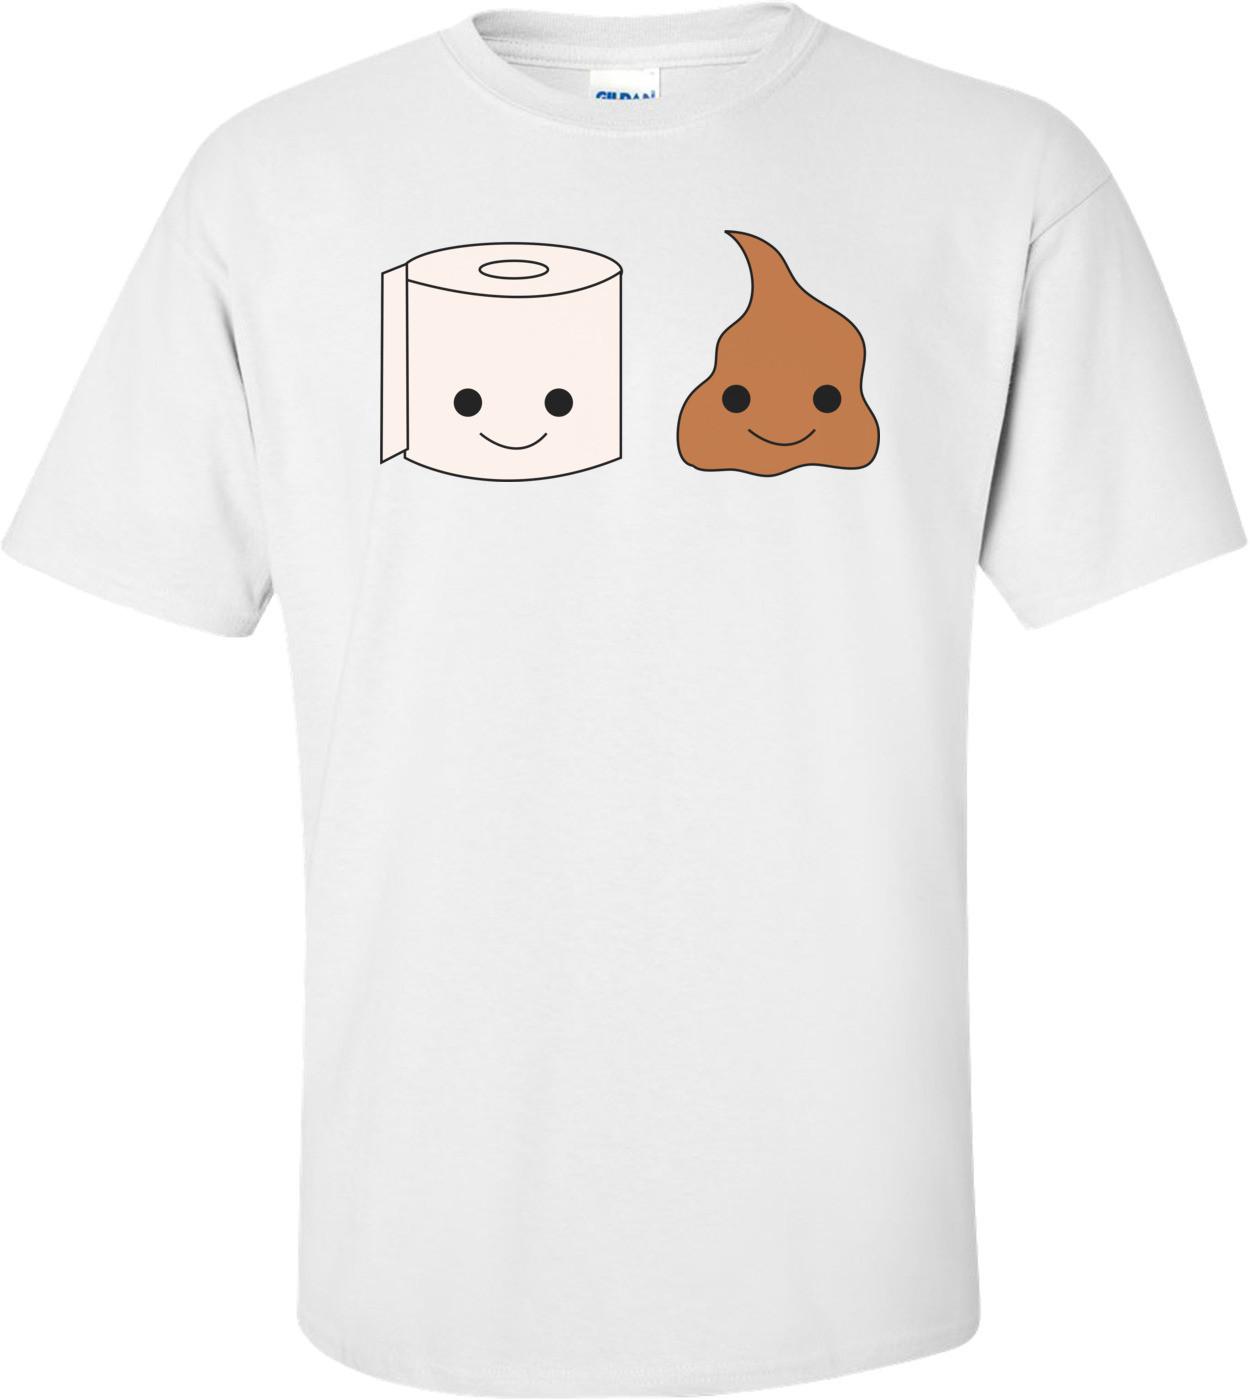 Bathroom Couple Funny Shirt